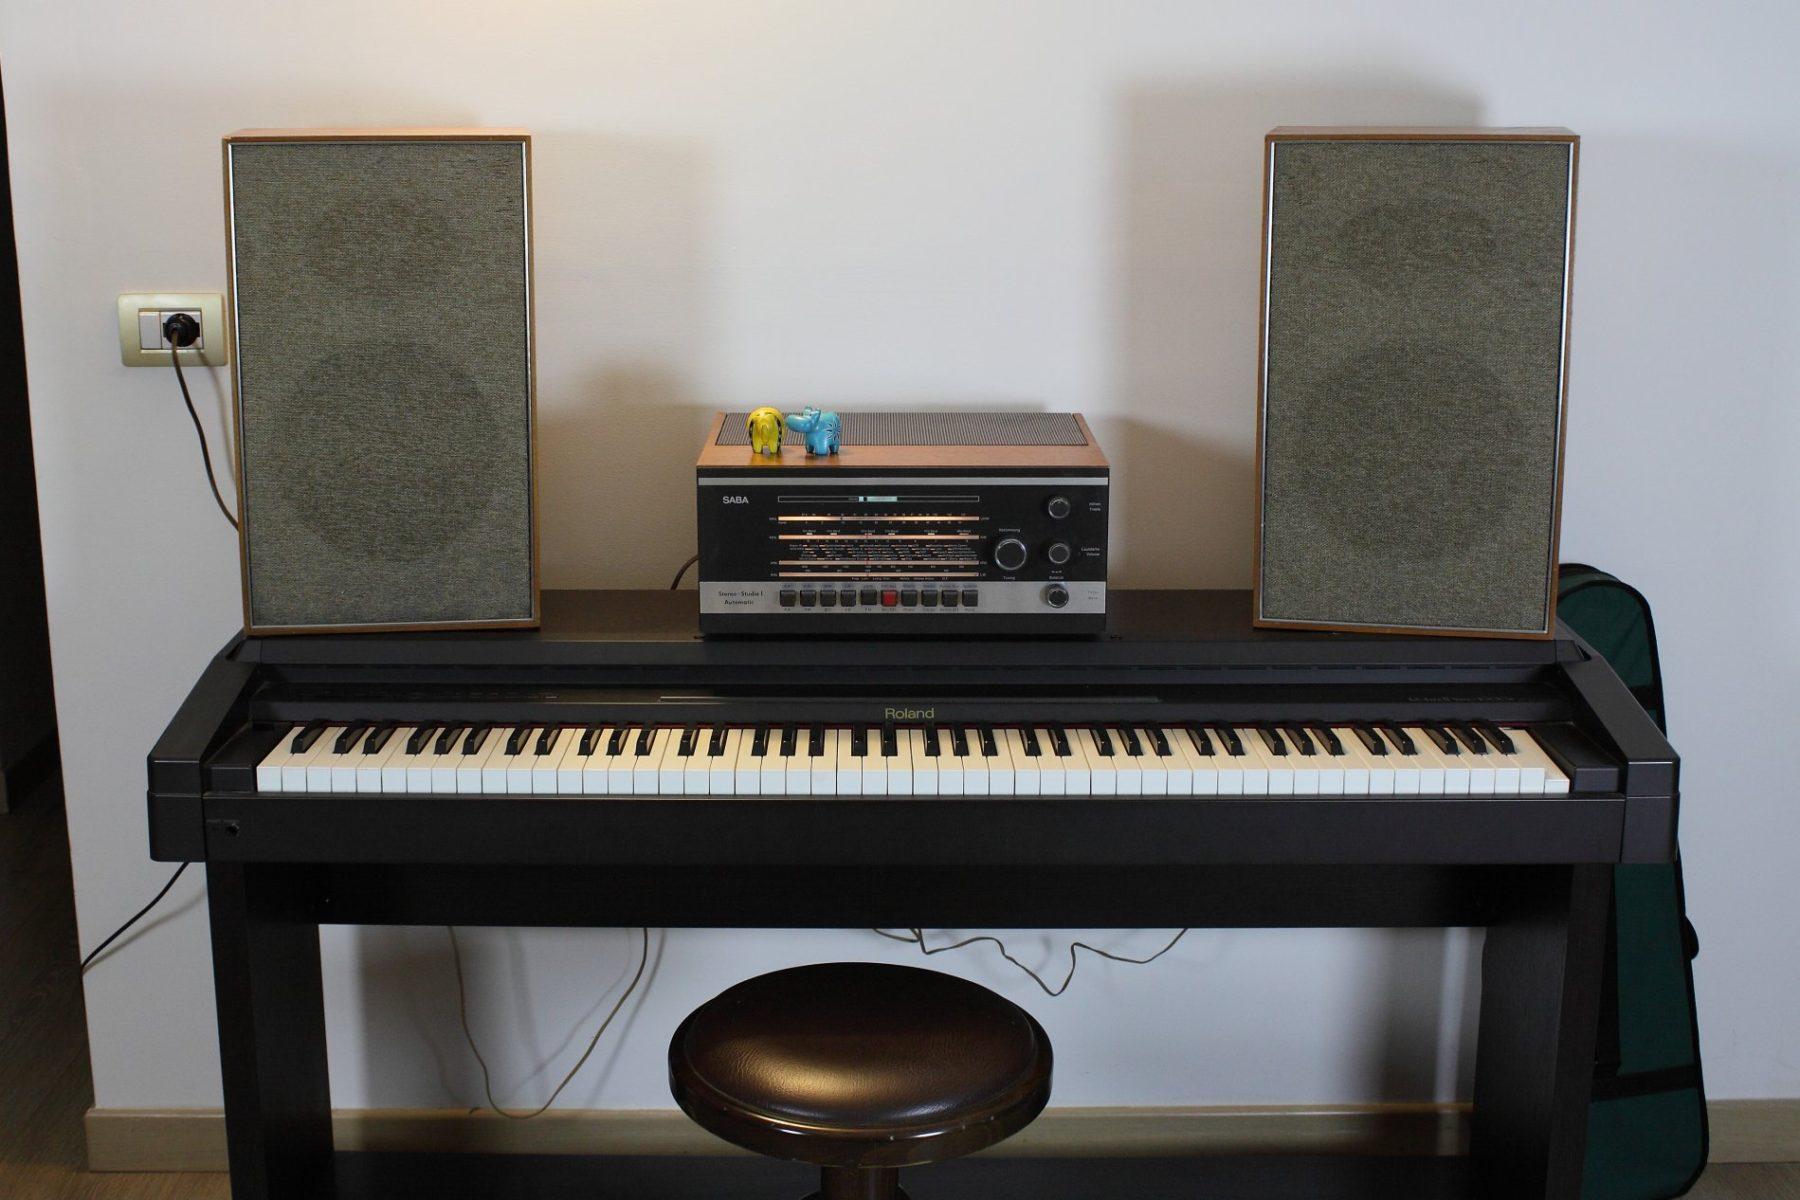 Saba Studio I Automatic